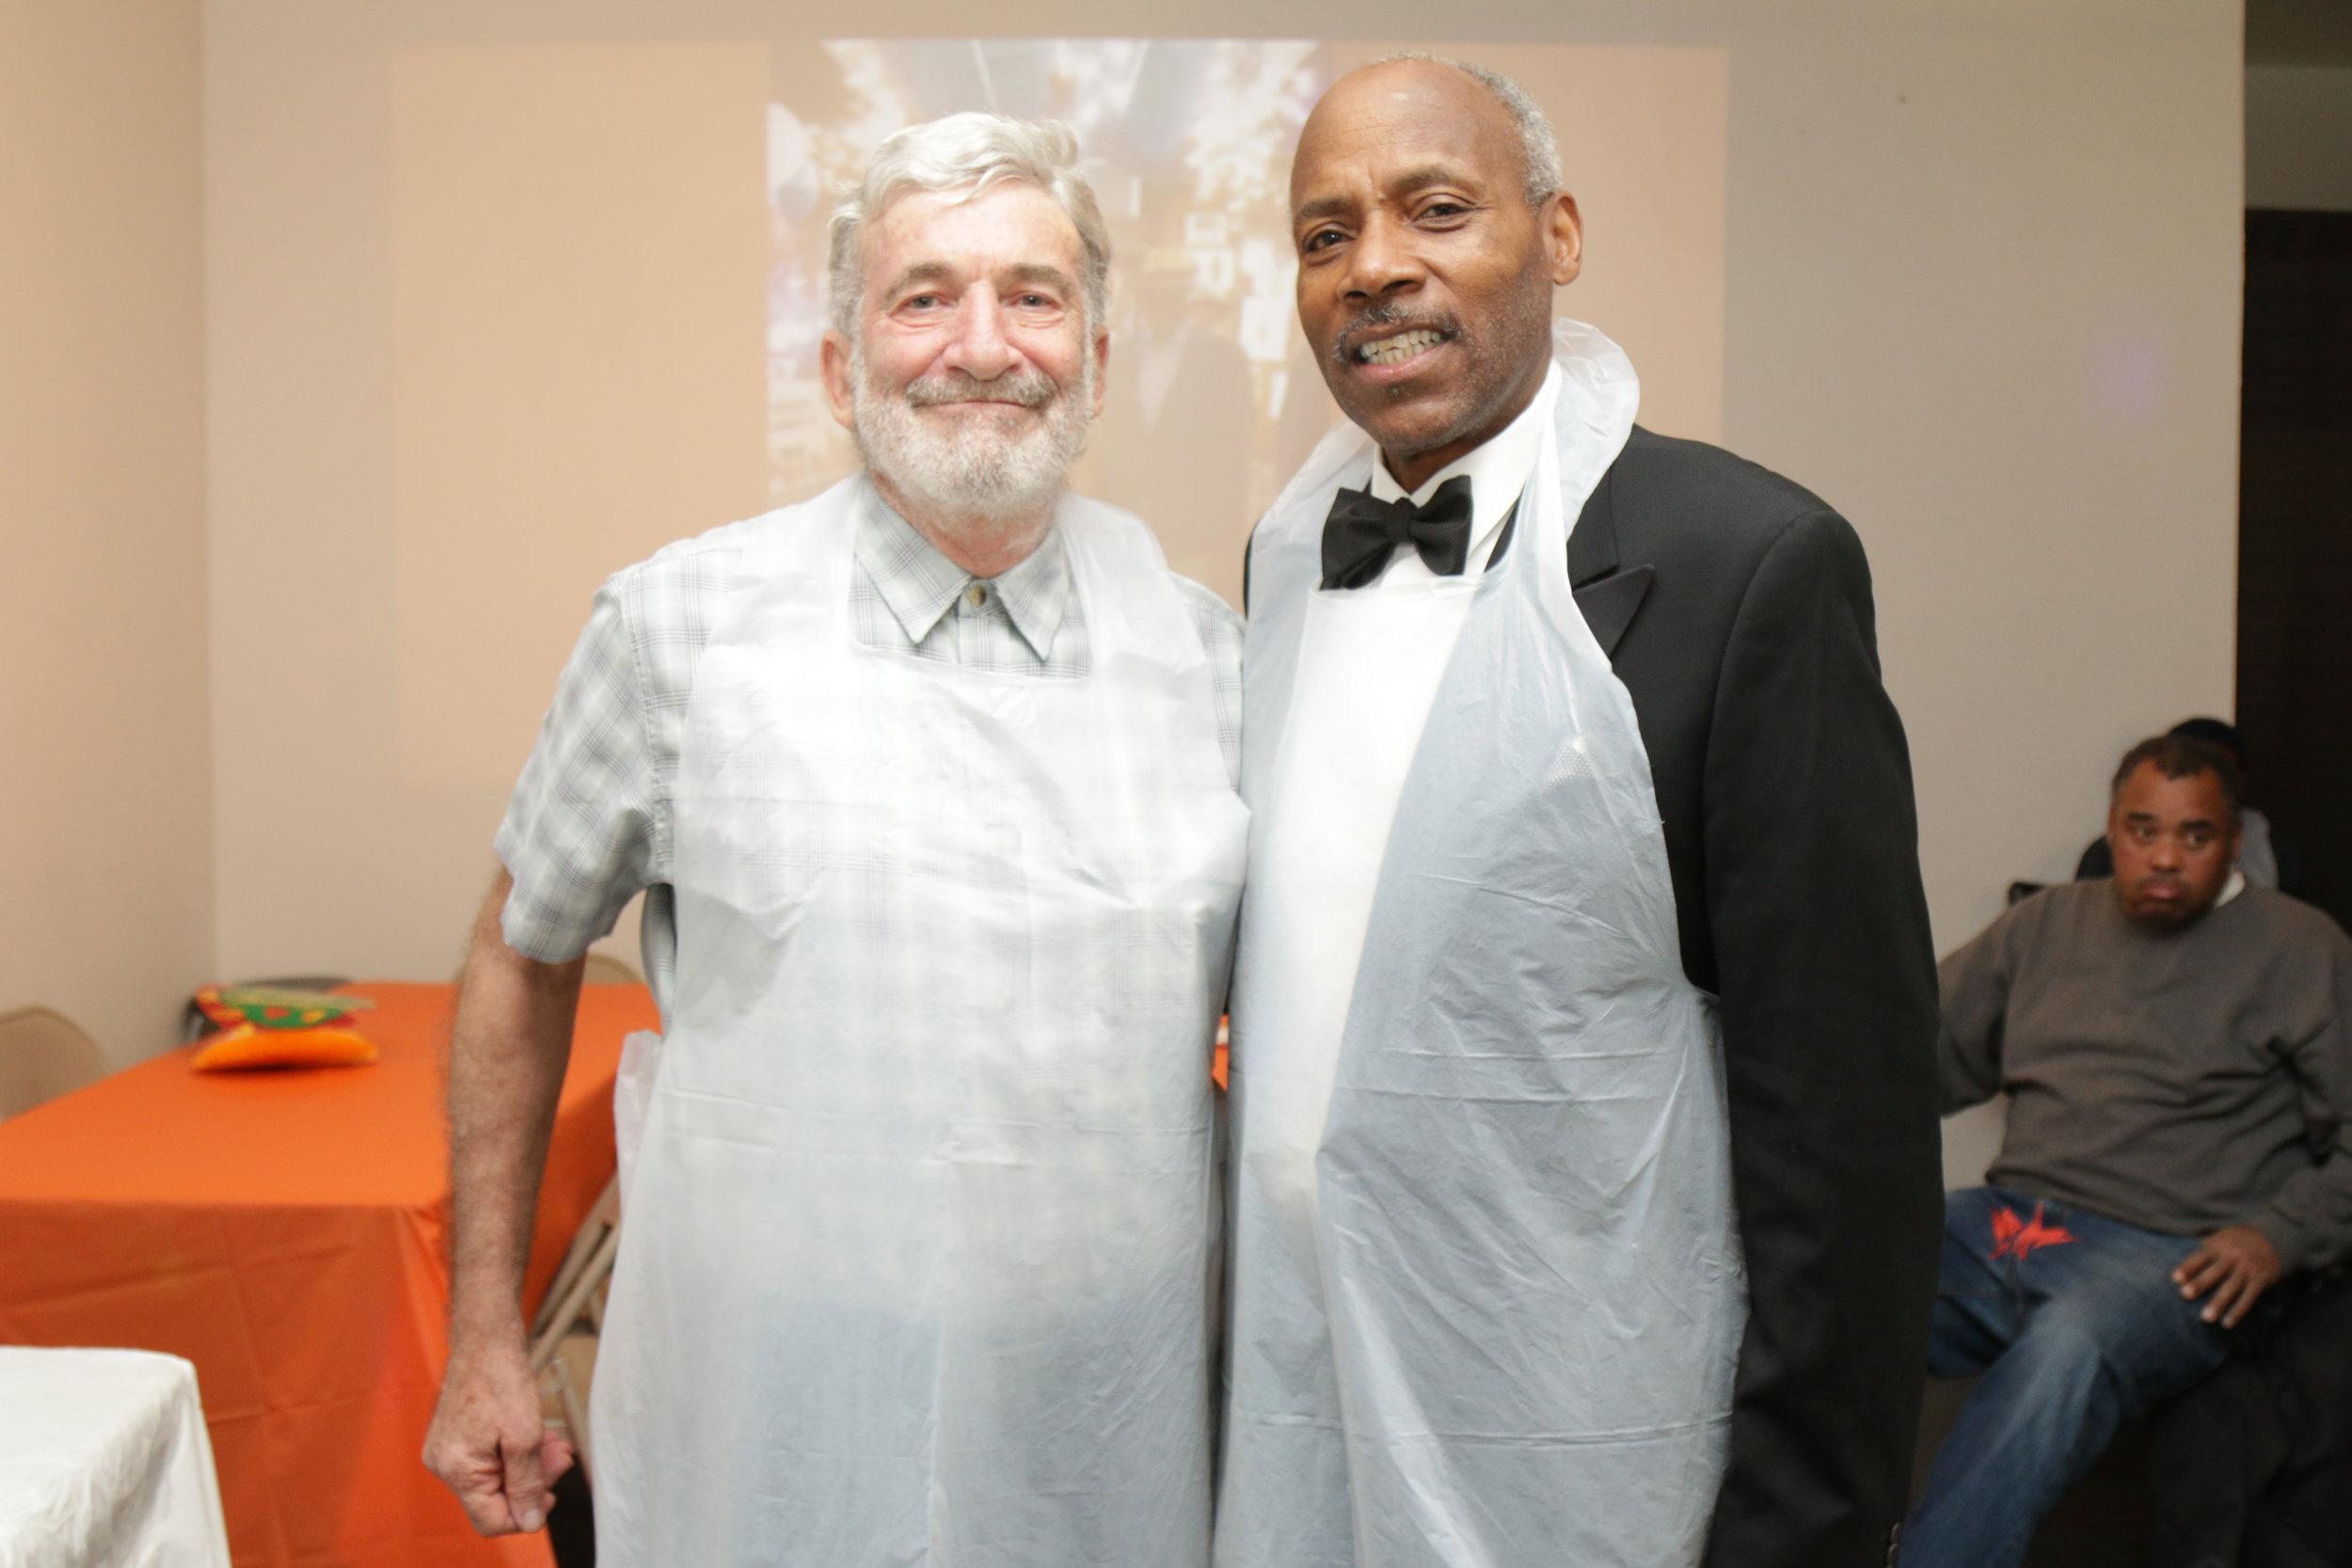 Jerry & City Councilman Bill Perkins